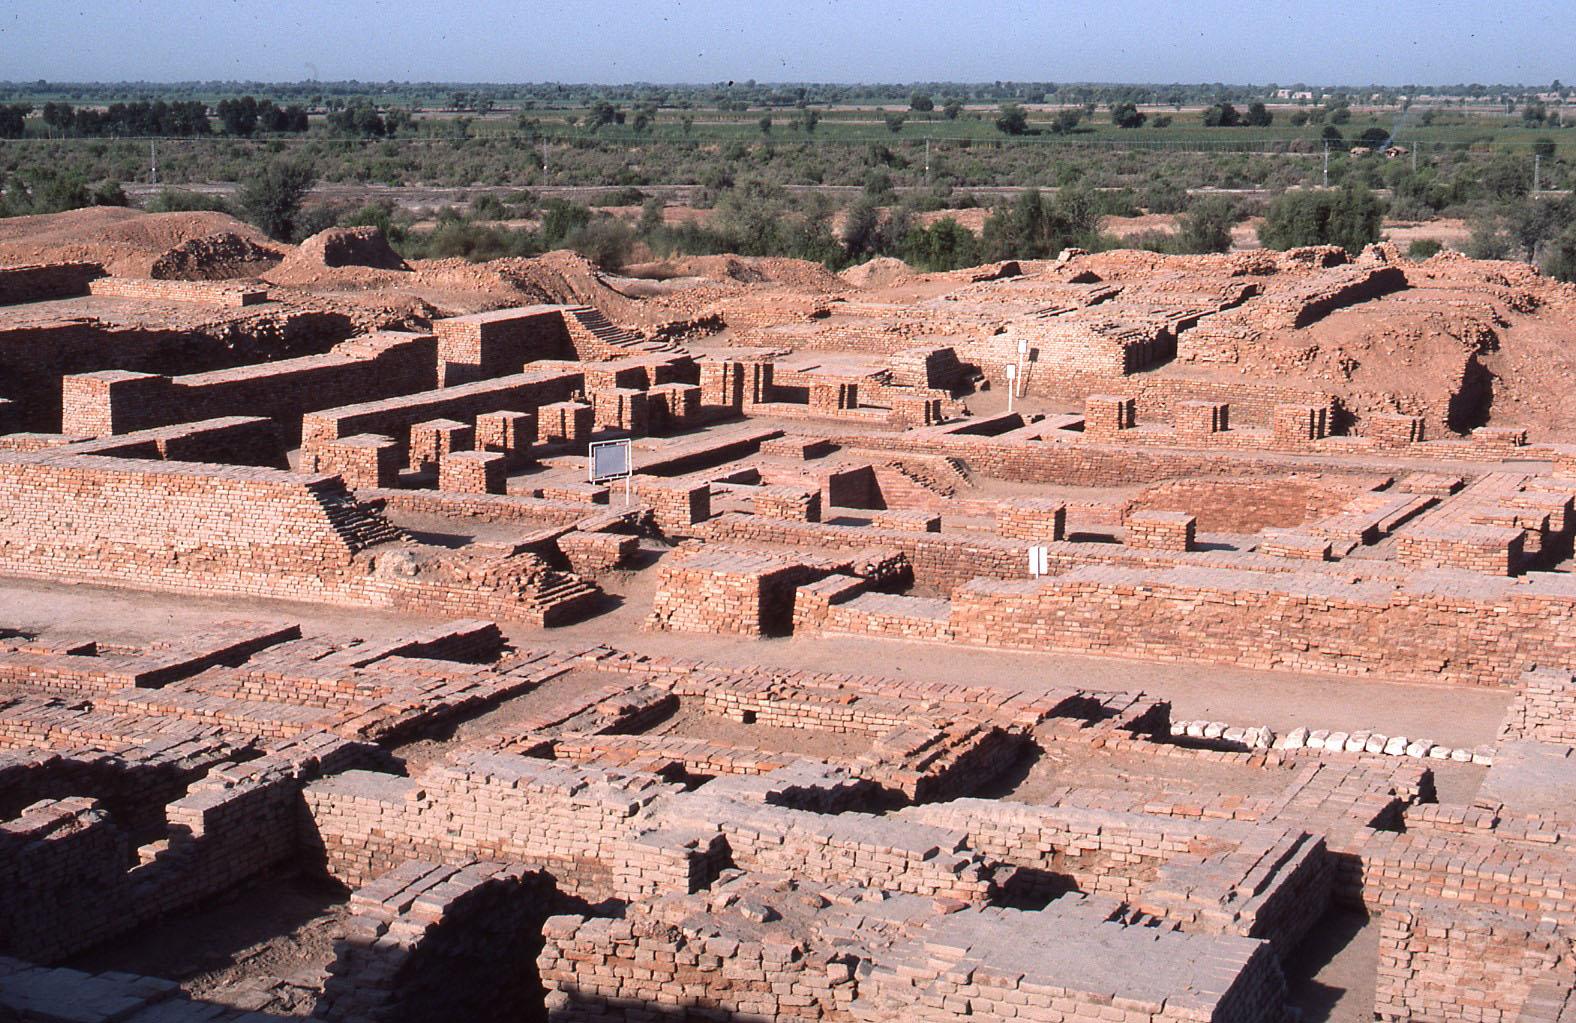 The lost city of Mohenjo Daro